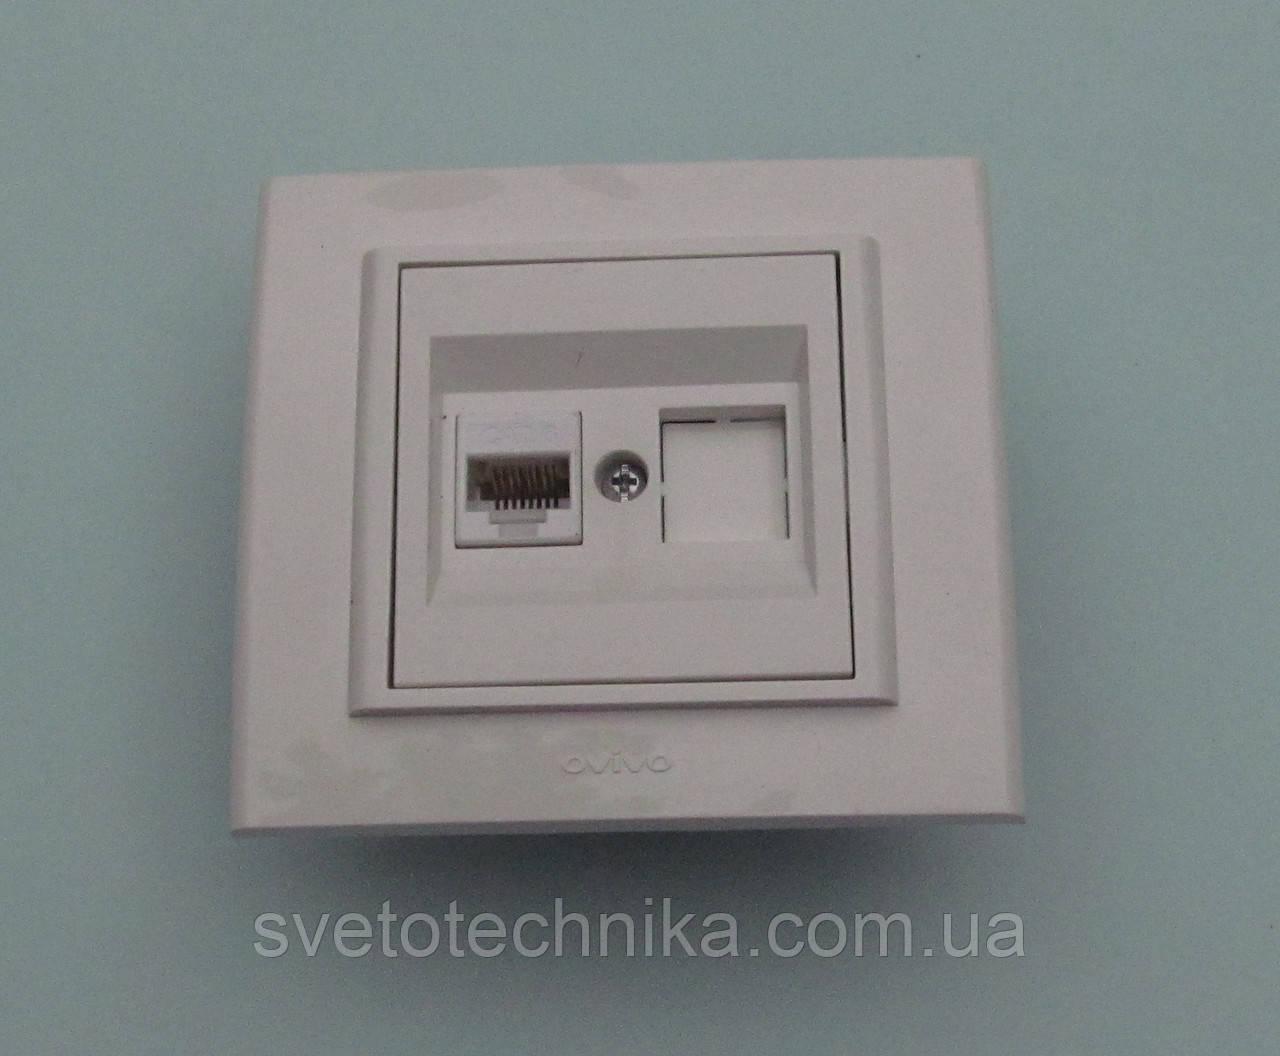 Розетка для компьютераOVIVO Mina(белого цвета)